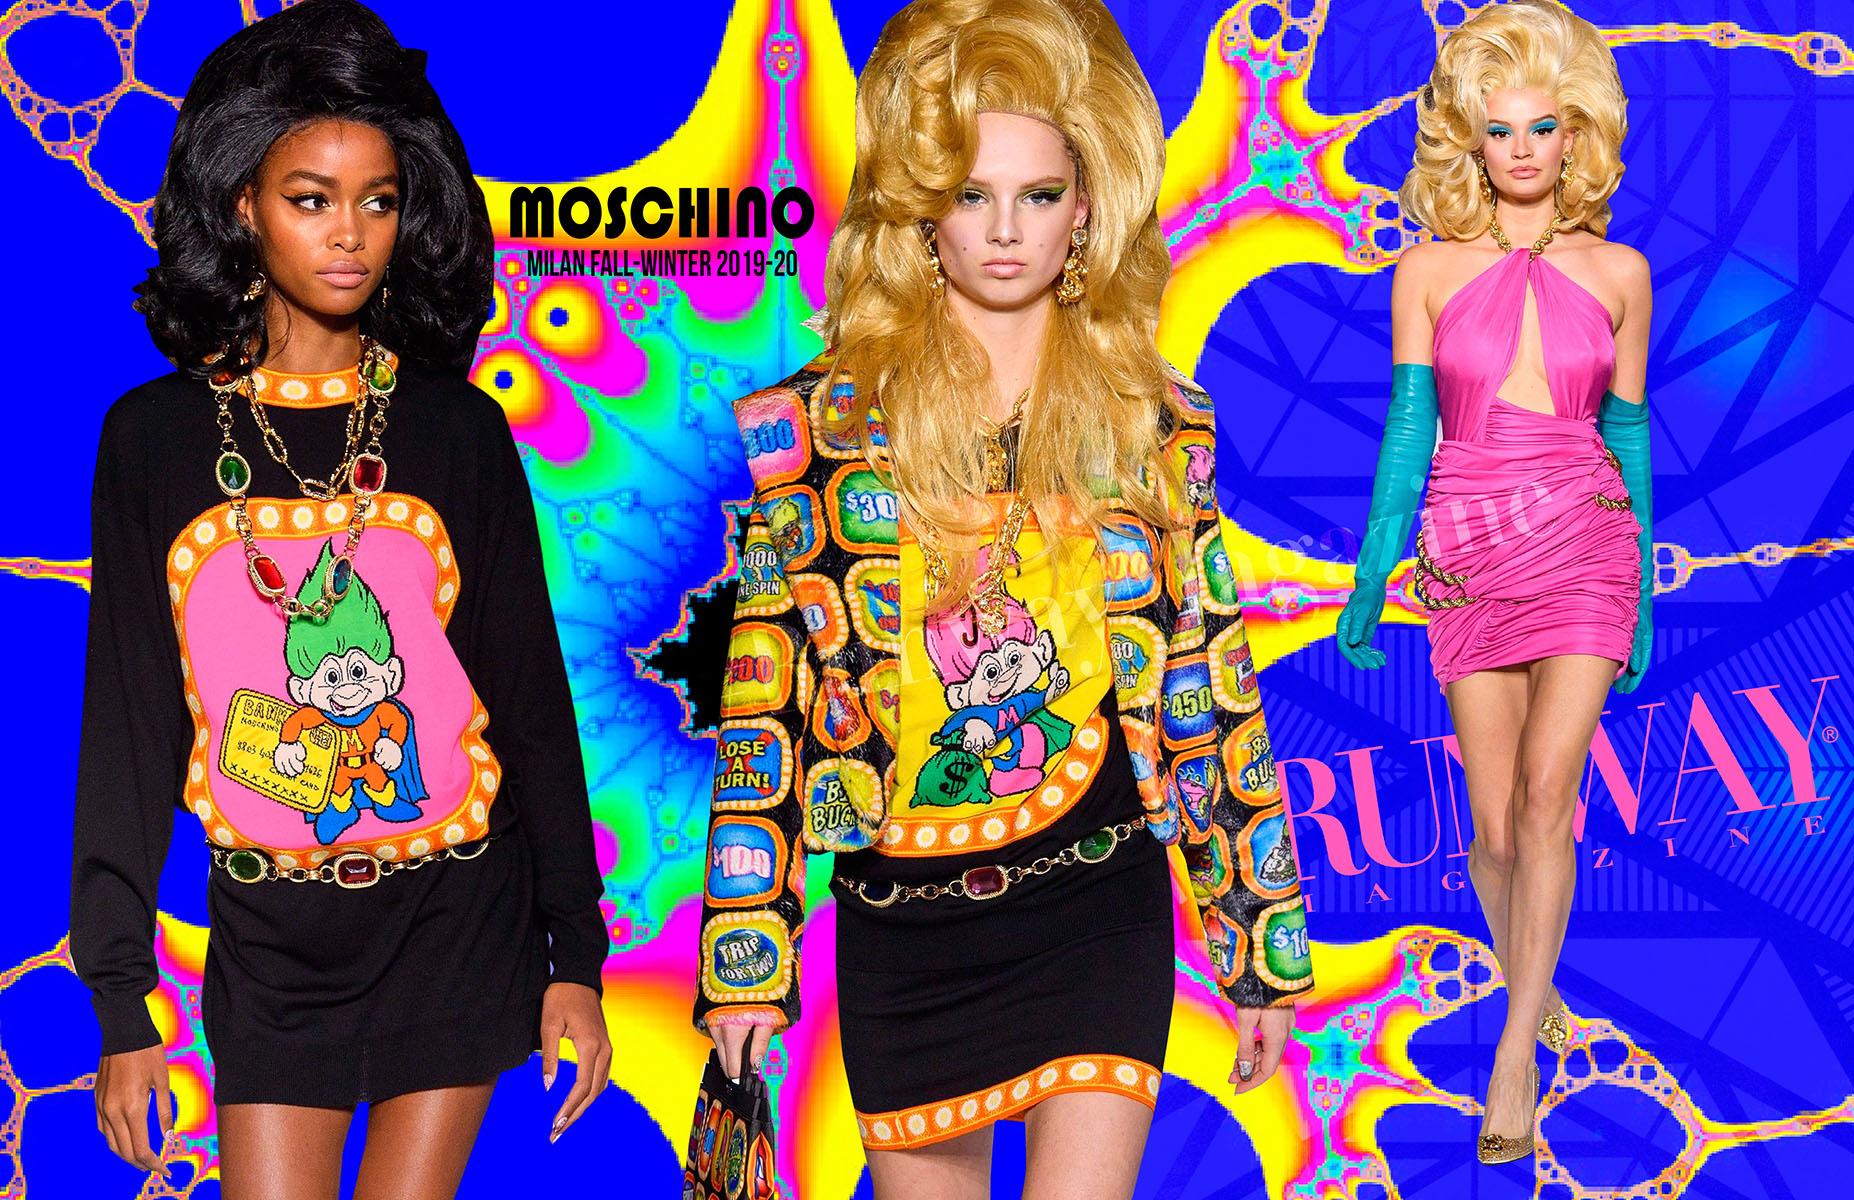 MOSCHINO Milan Fashion Week Fall Winter 2019-2020 by Runway Magazine